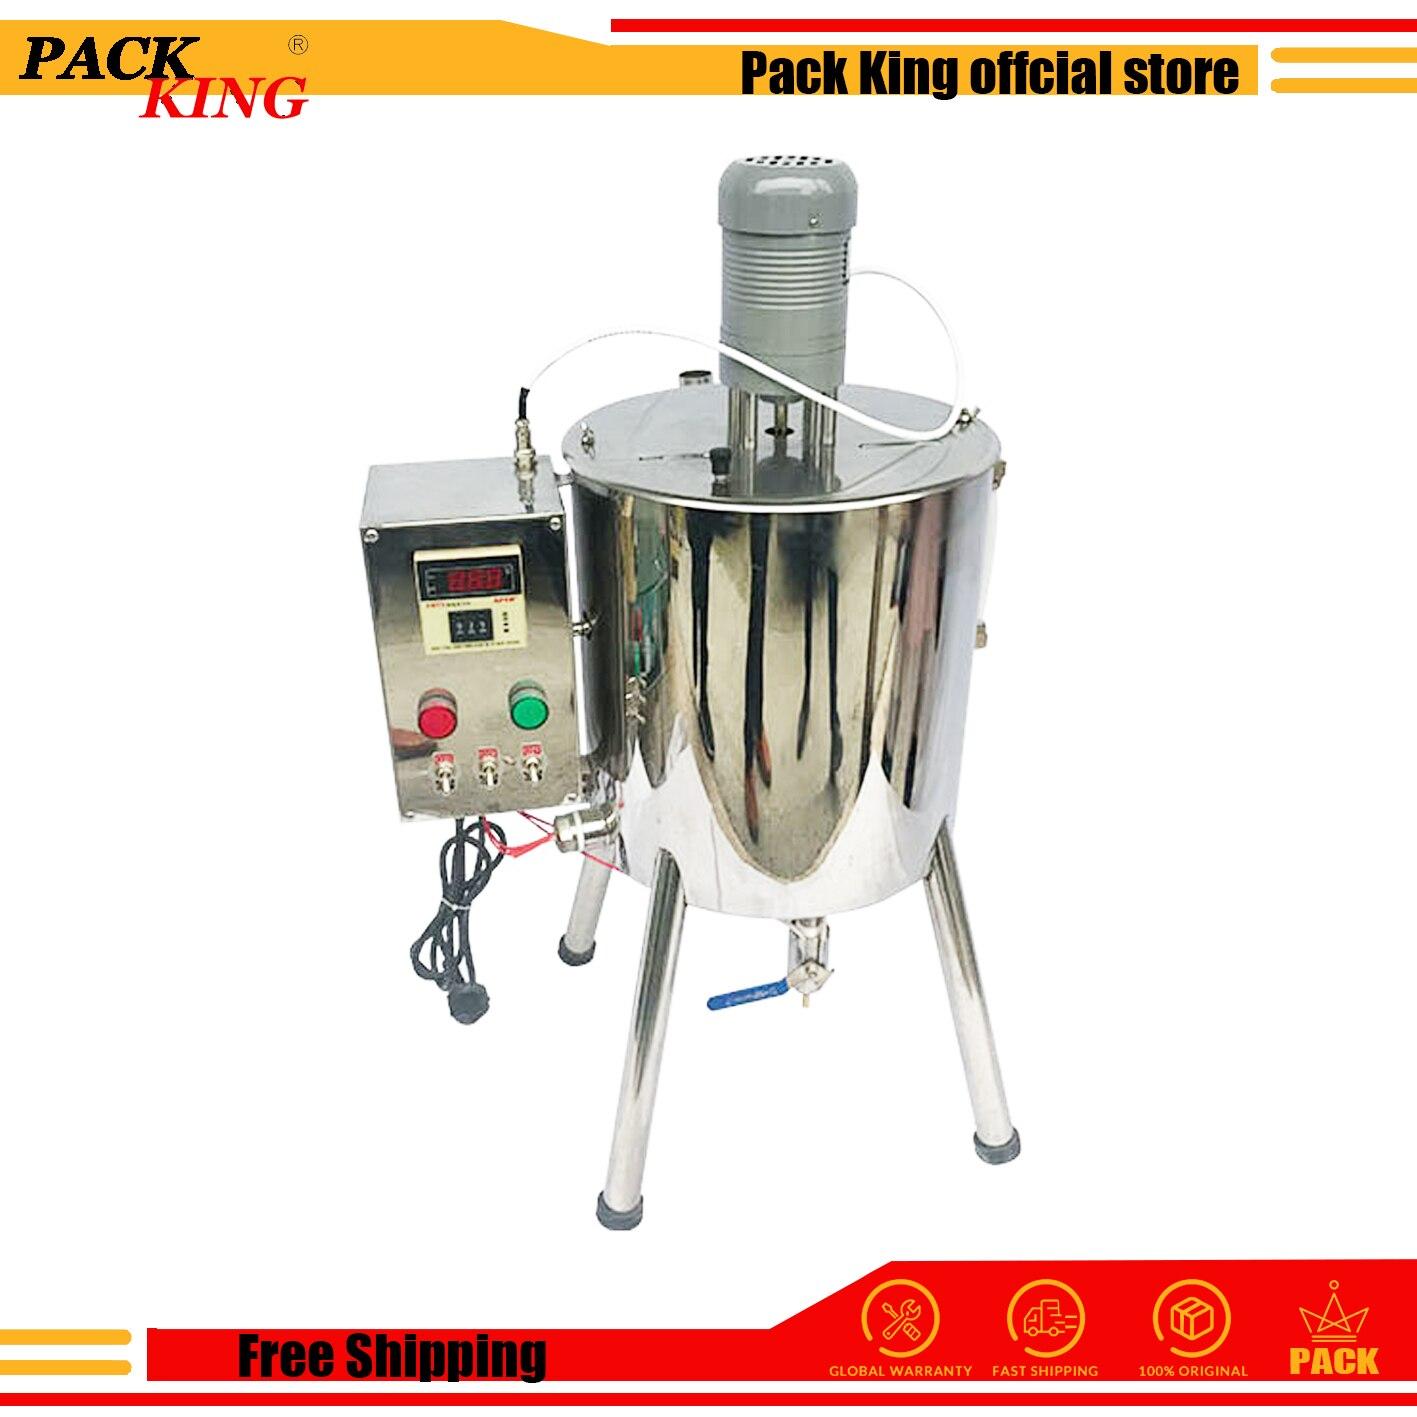 Heating And Stirring Filling Machine Lipstick Hand Soap Filler Heater Making Device Lip Stick Heat Tank Free Shipping